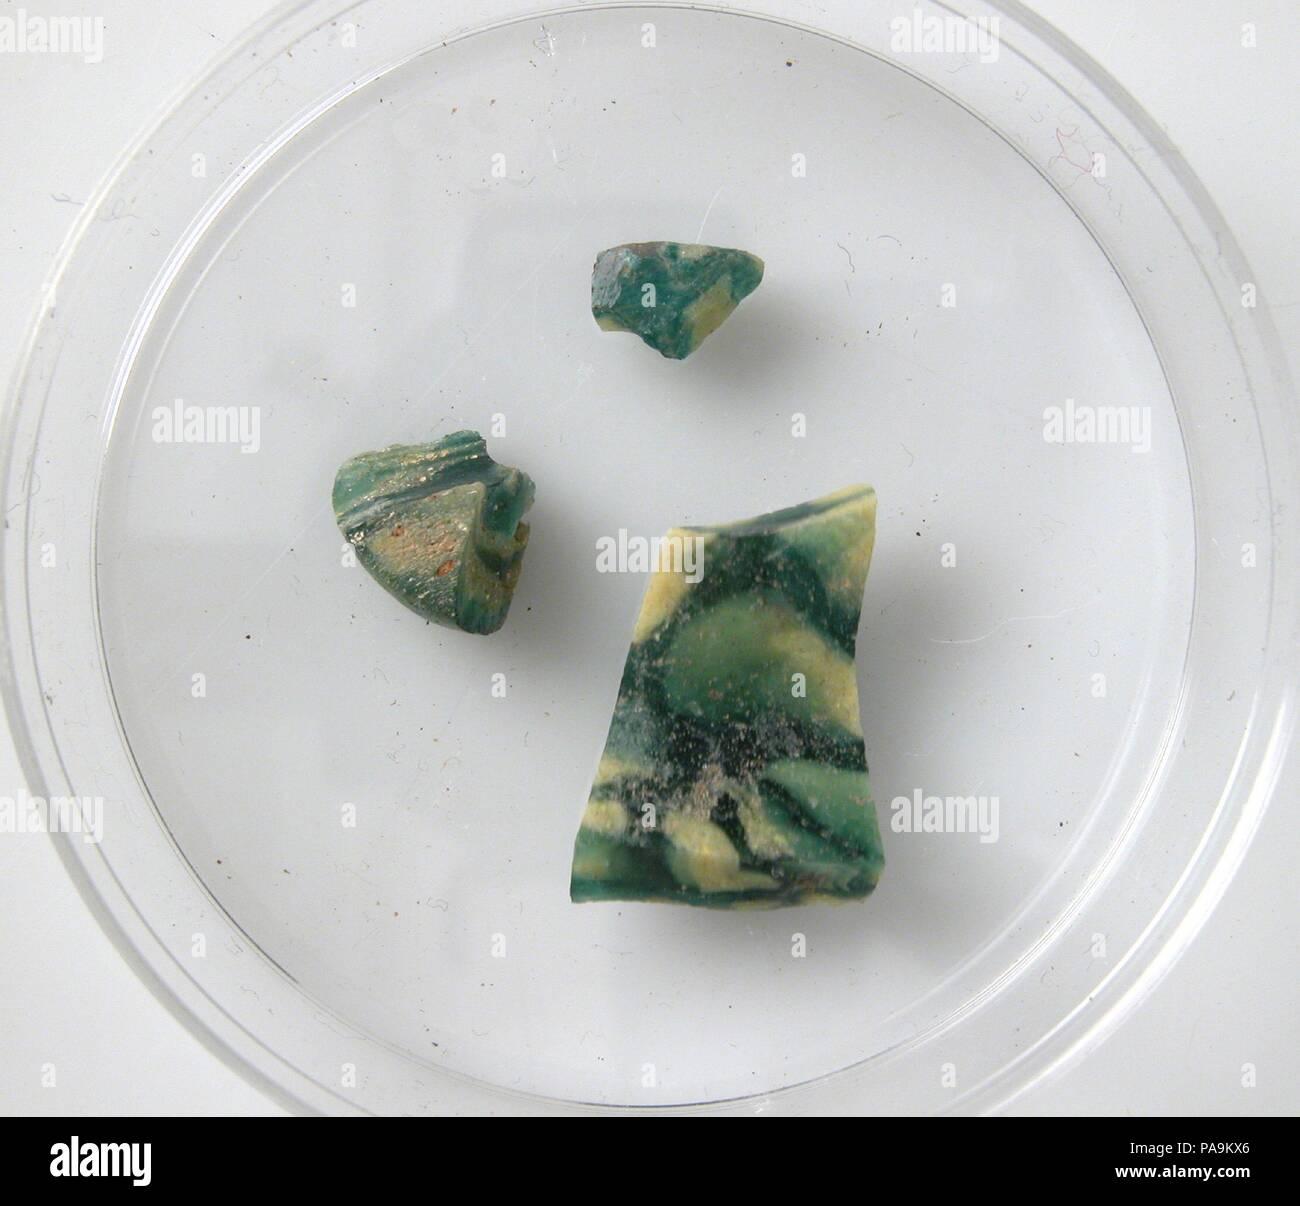 Glass Fragments. Culture: Coptic. Dimensions: Storage (petri dish diam.): 2 3/16 in. (5.5 cm). Date: 4th-7th century. Museum: Metropolitan Museum of Art, New York, USA. - Stock Image